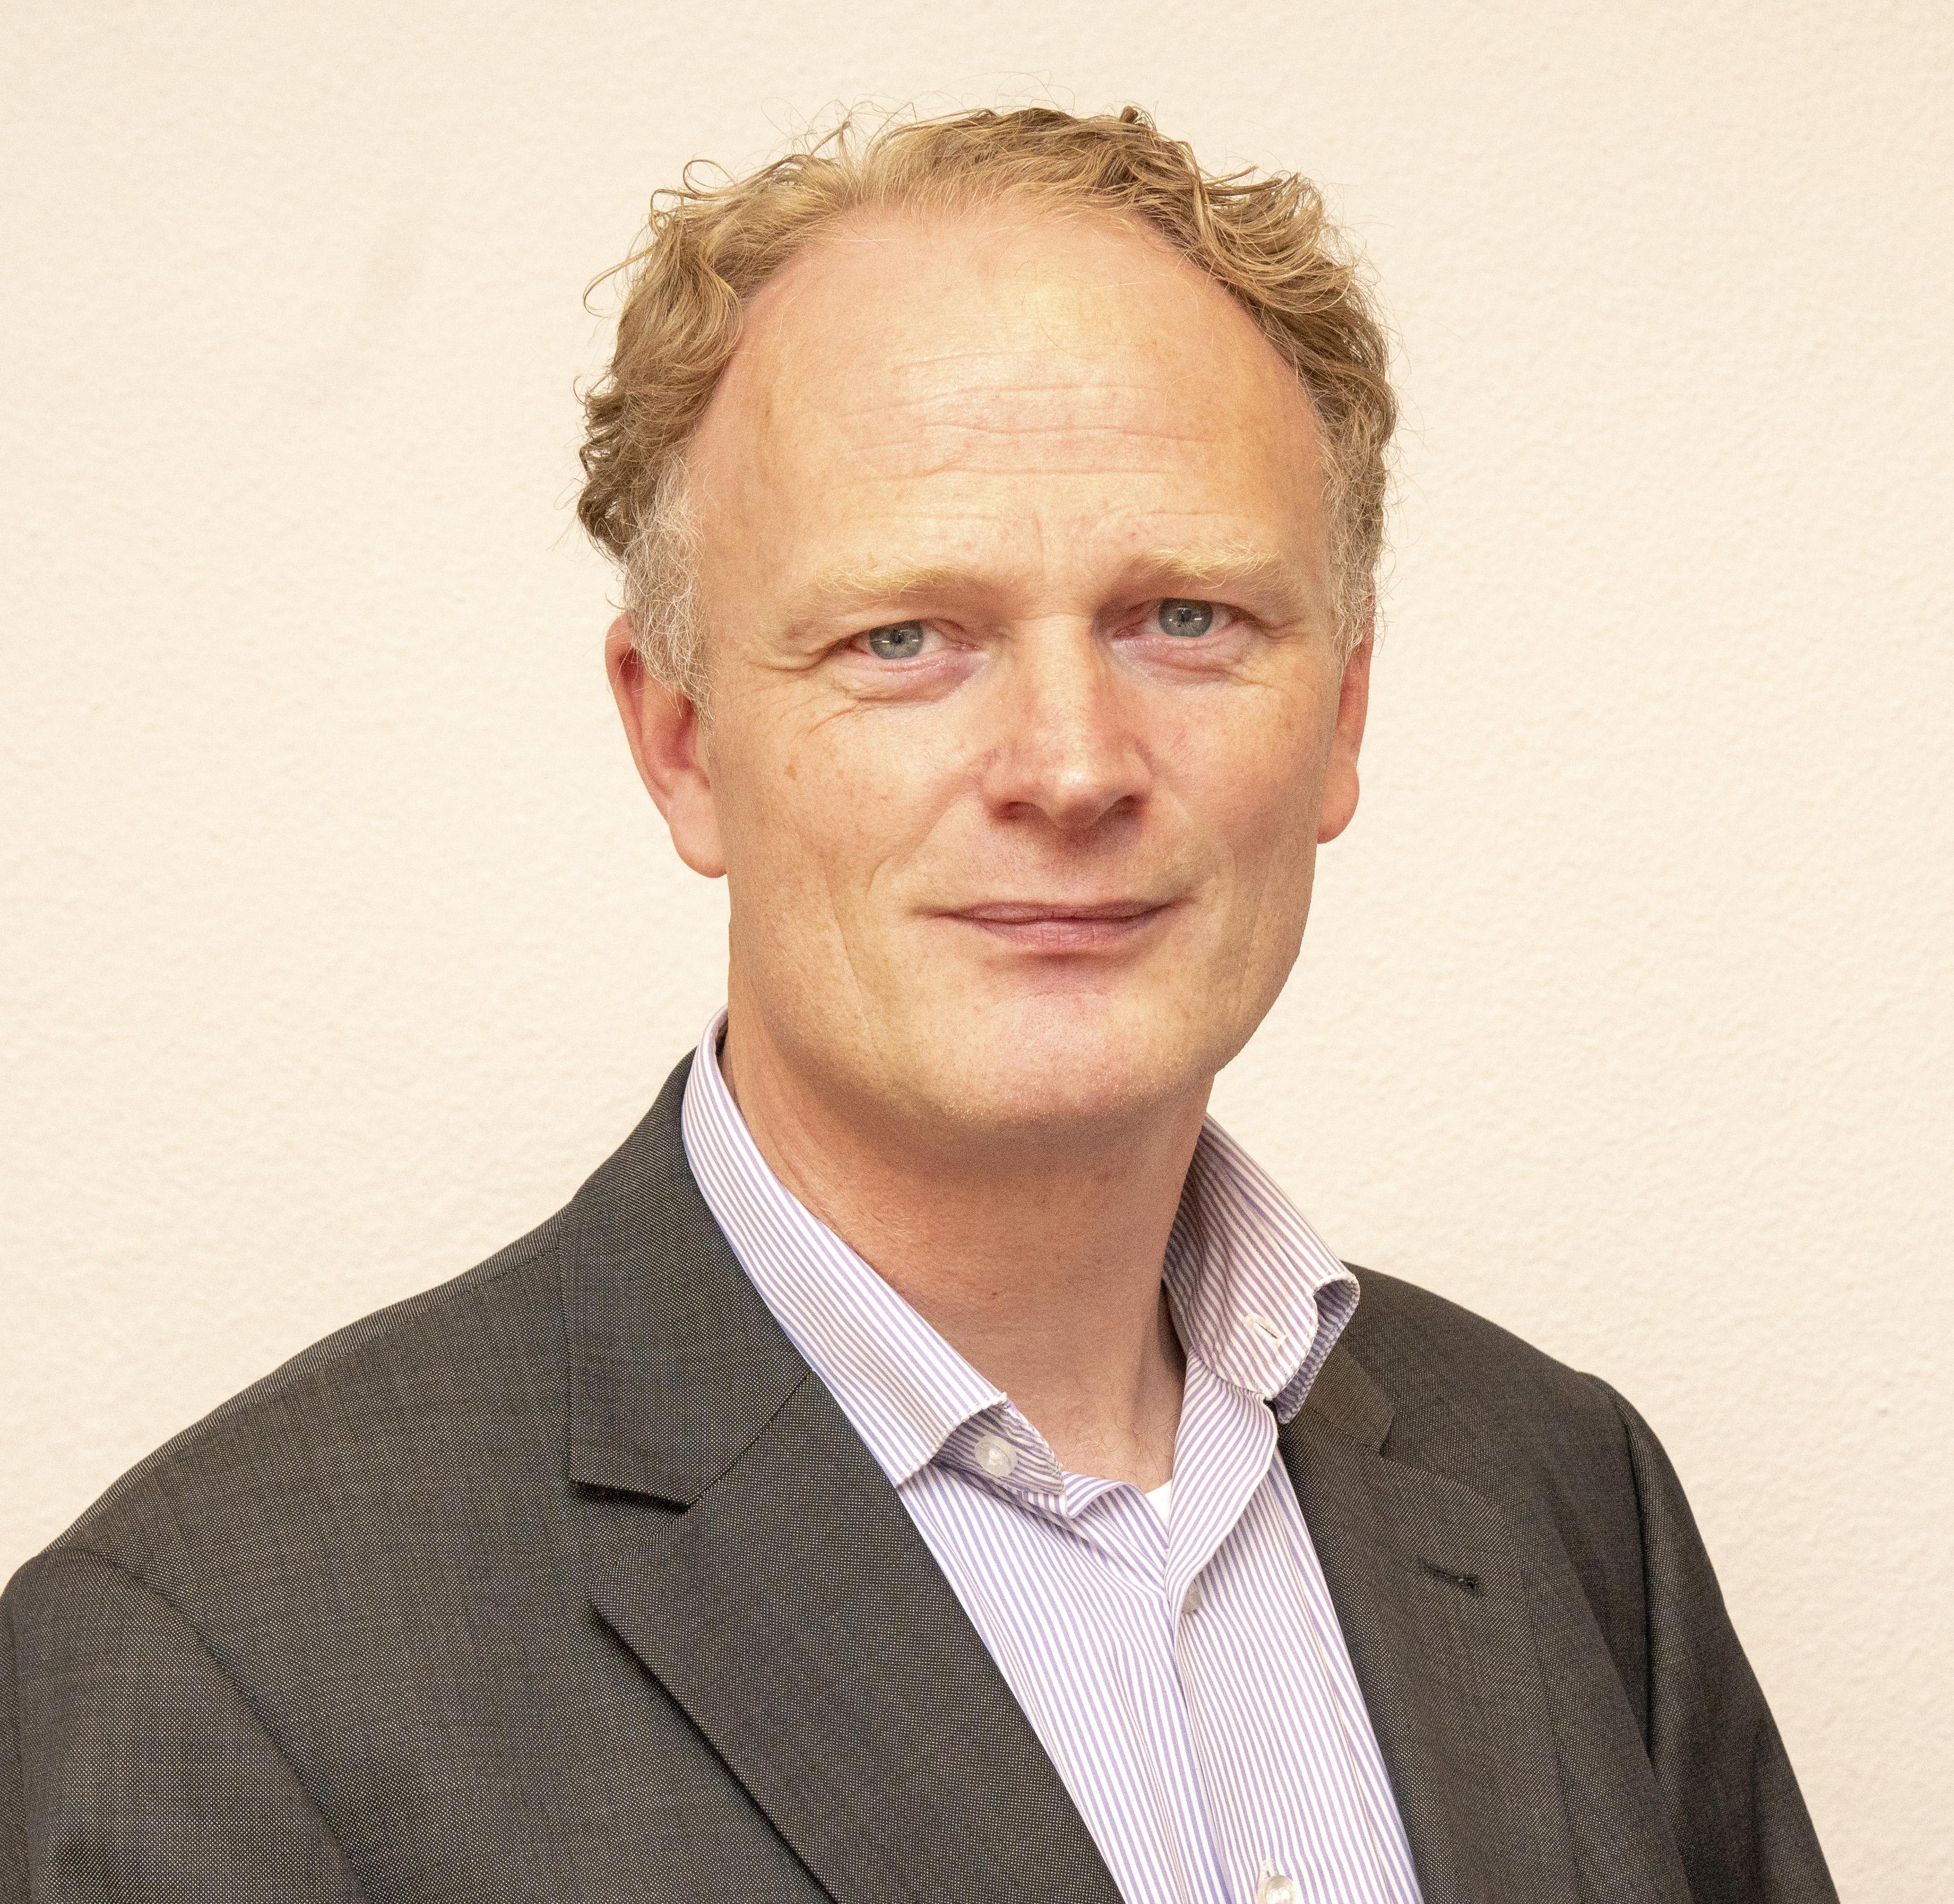 Willem Camphuis